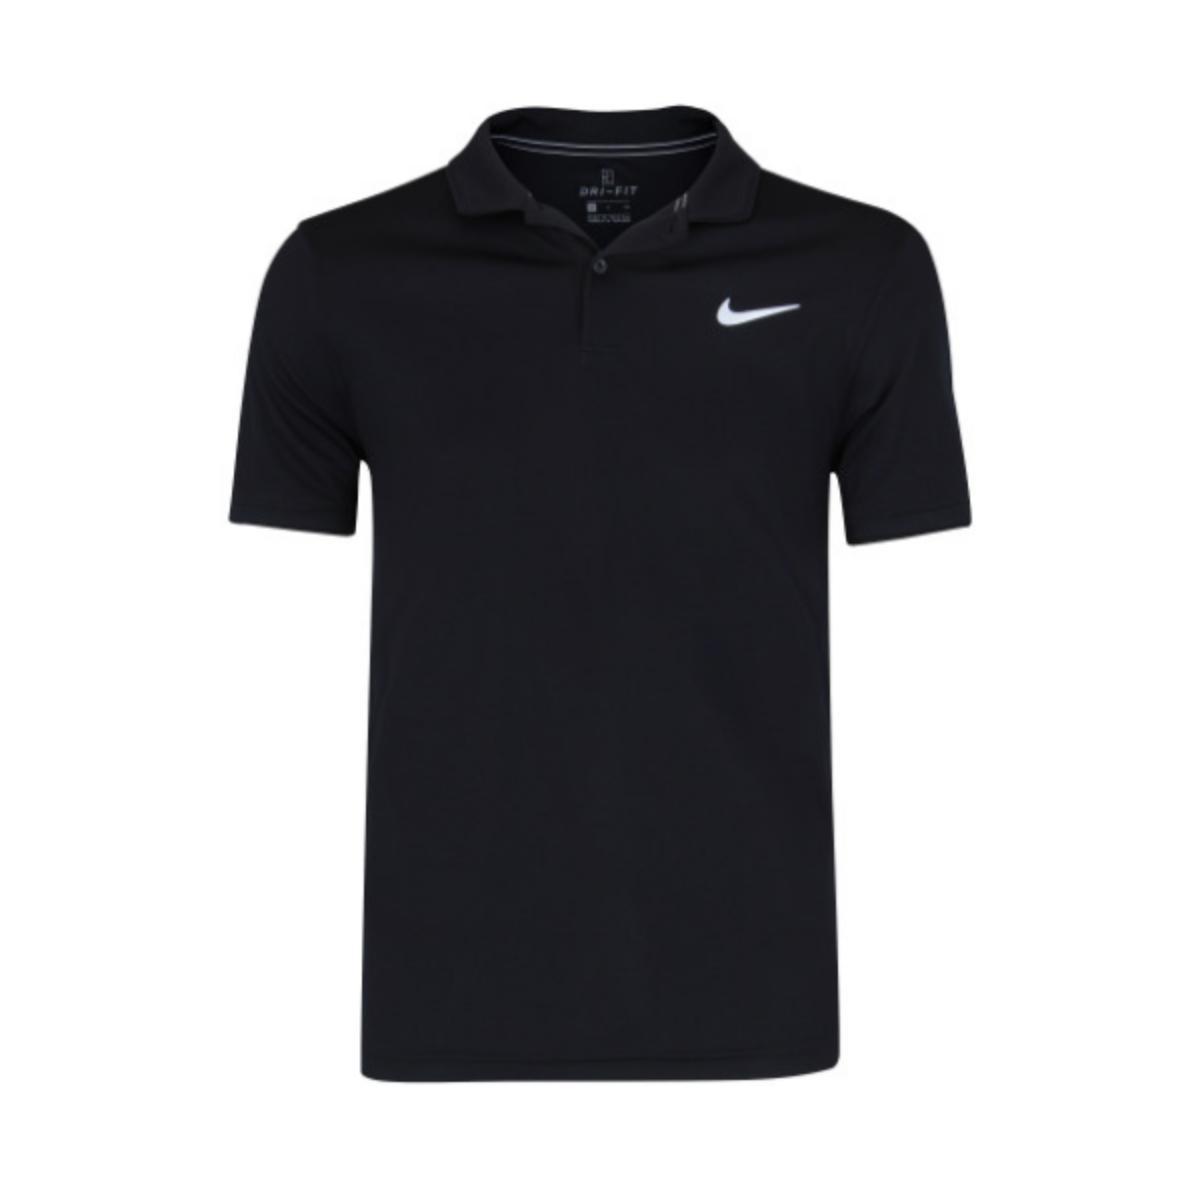 Camiseta Masculina Nike Cj4456-010 Preto